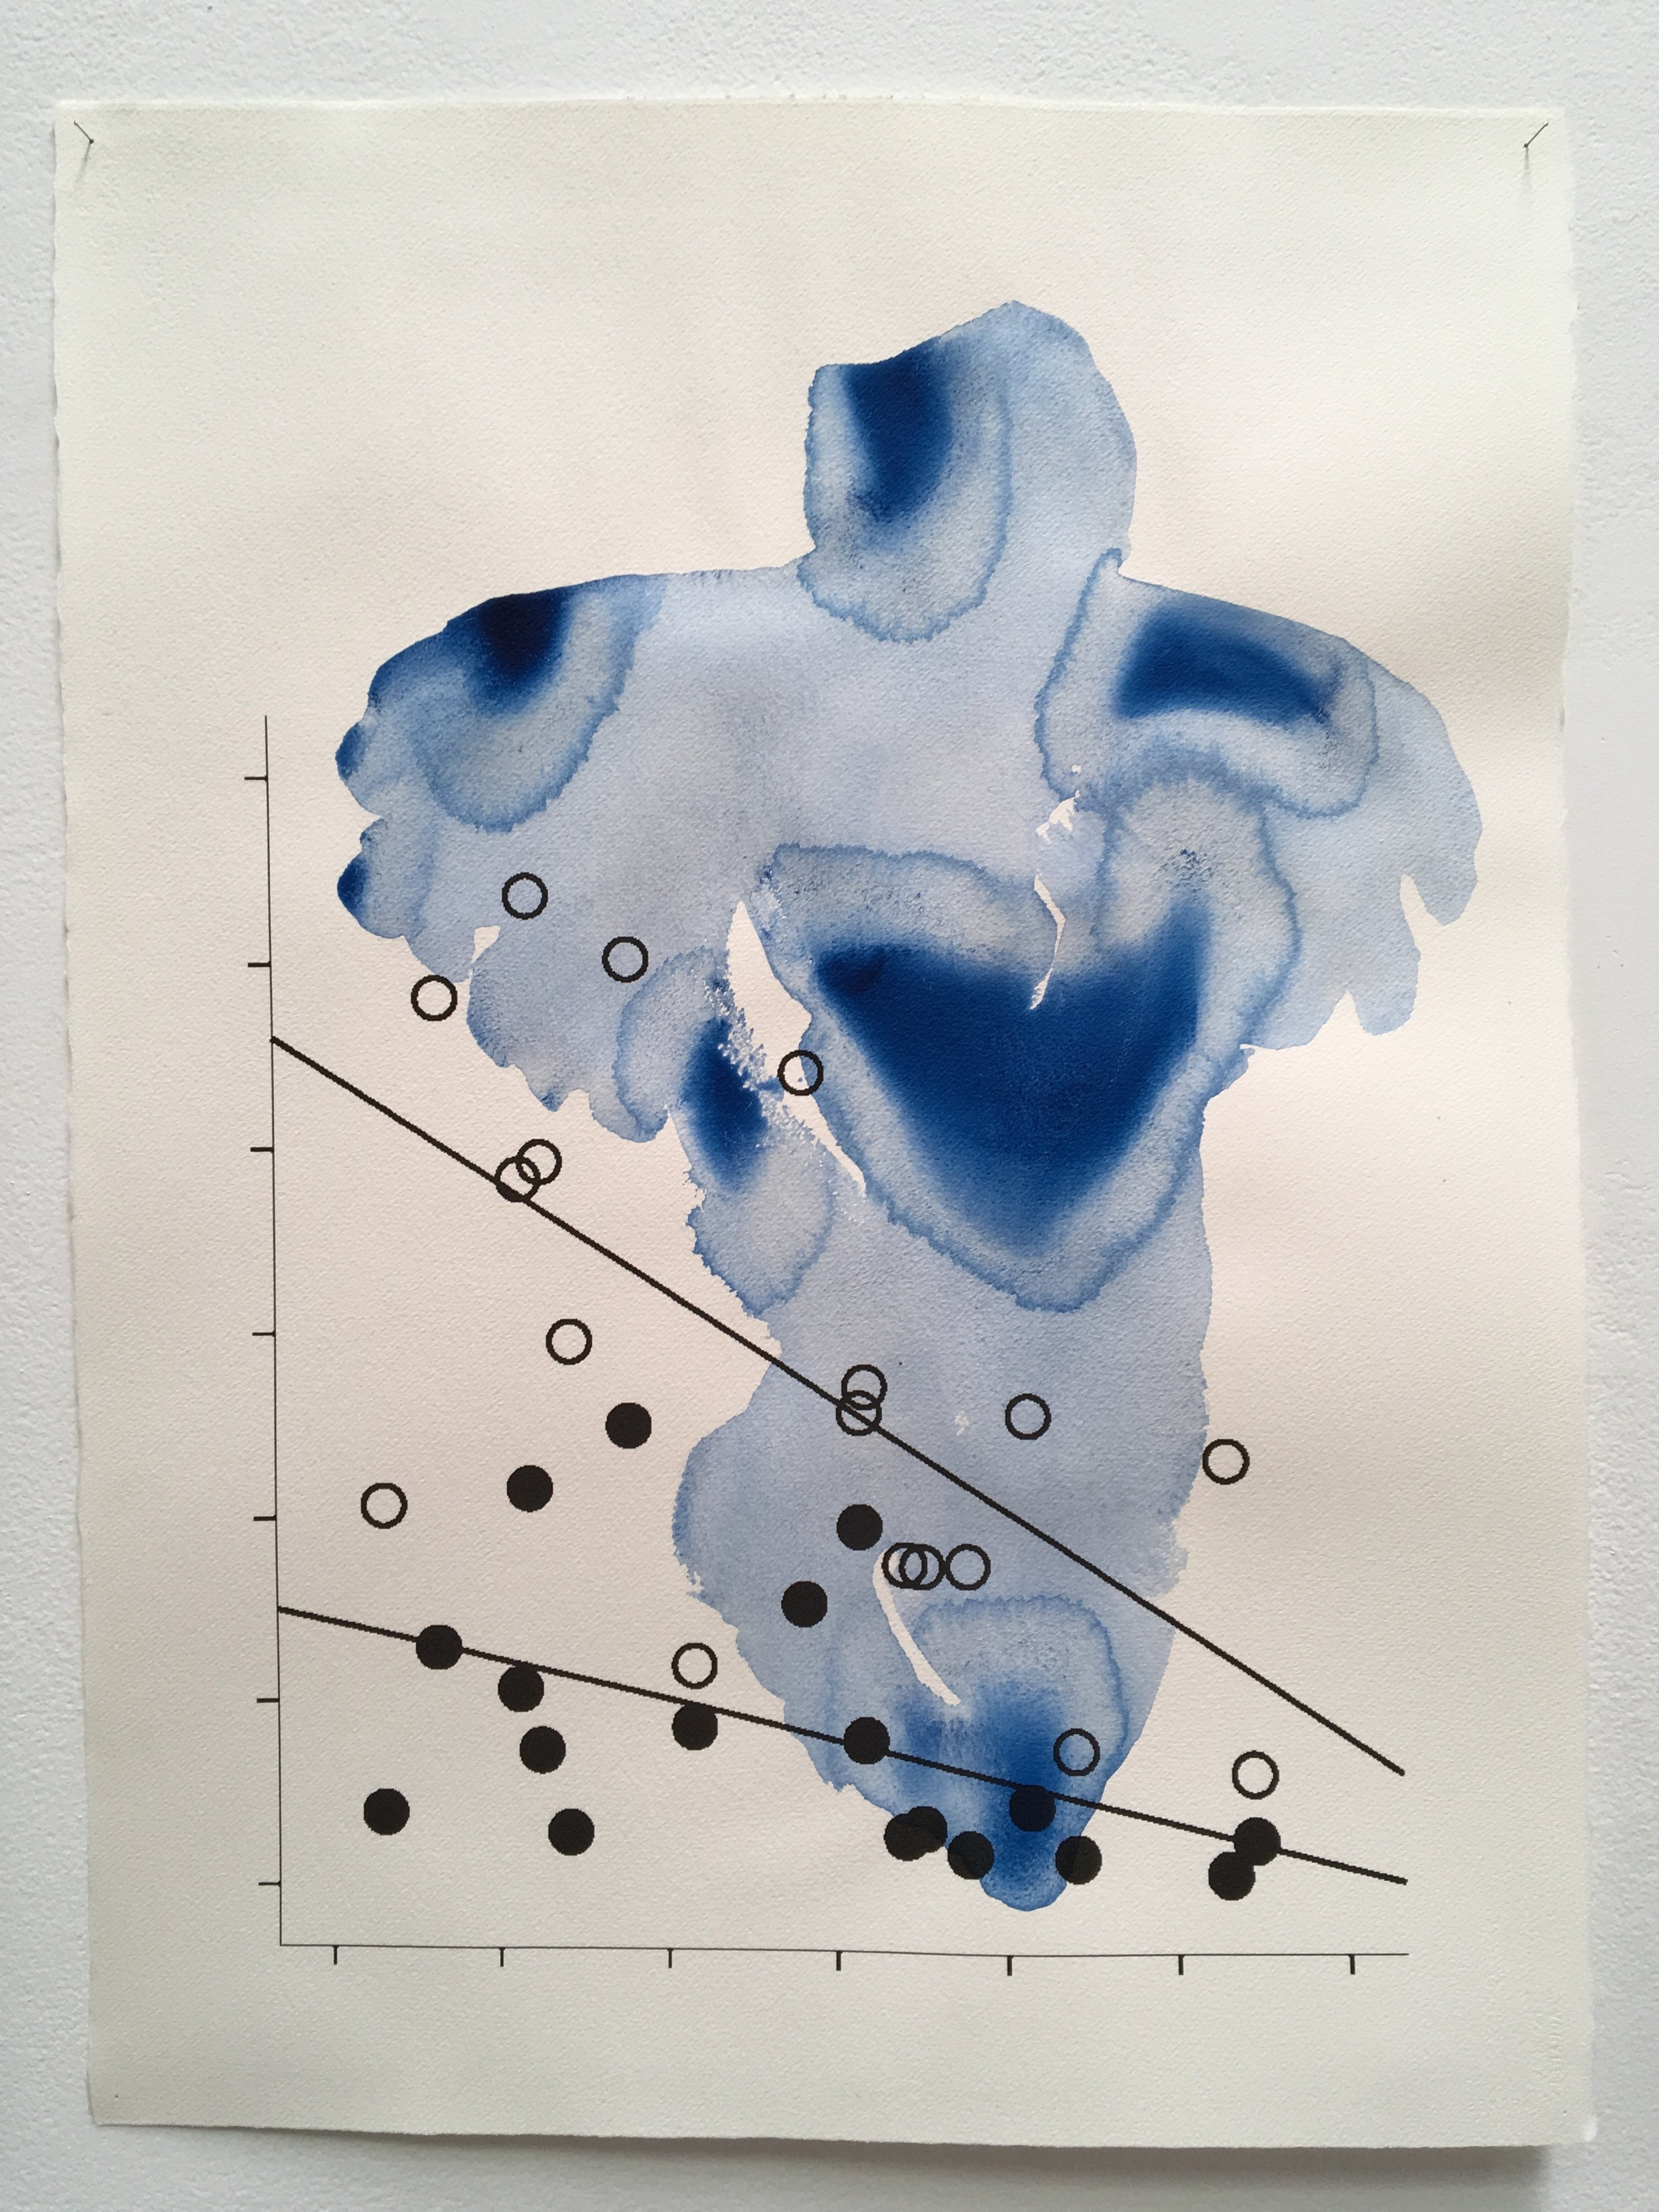 Judy Watson heron island 8 2009-16 acrylic and digital print on paper 77 x 57 cm.jpg